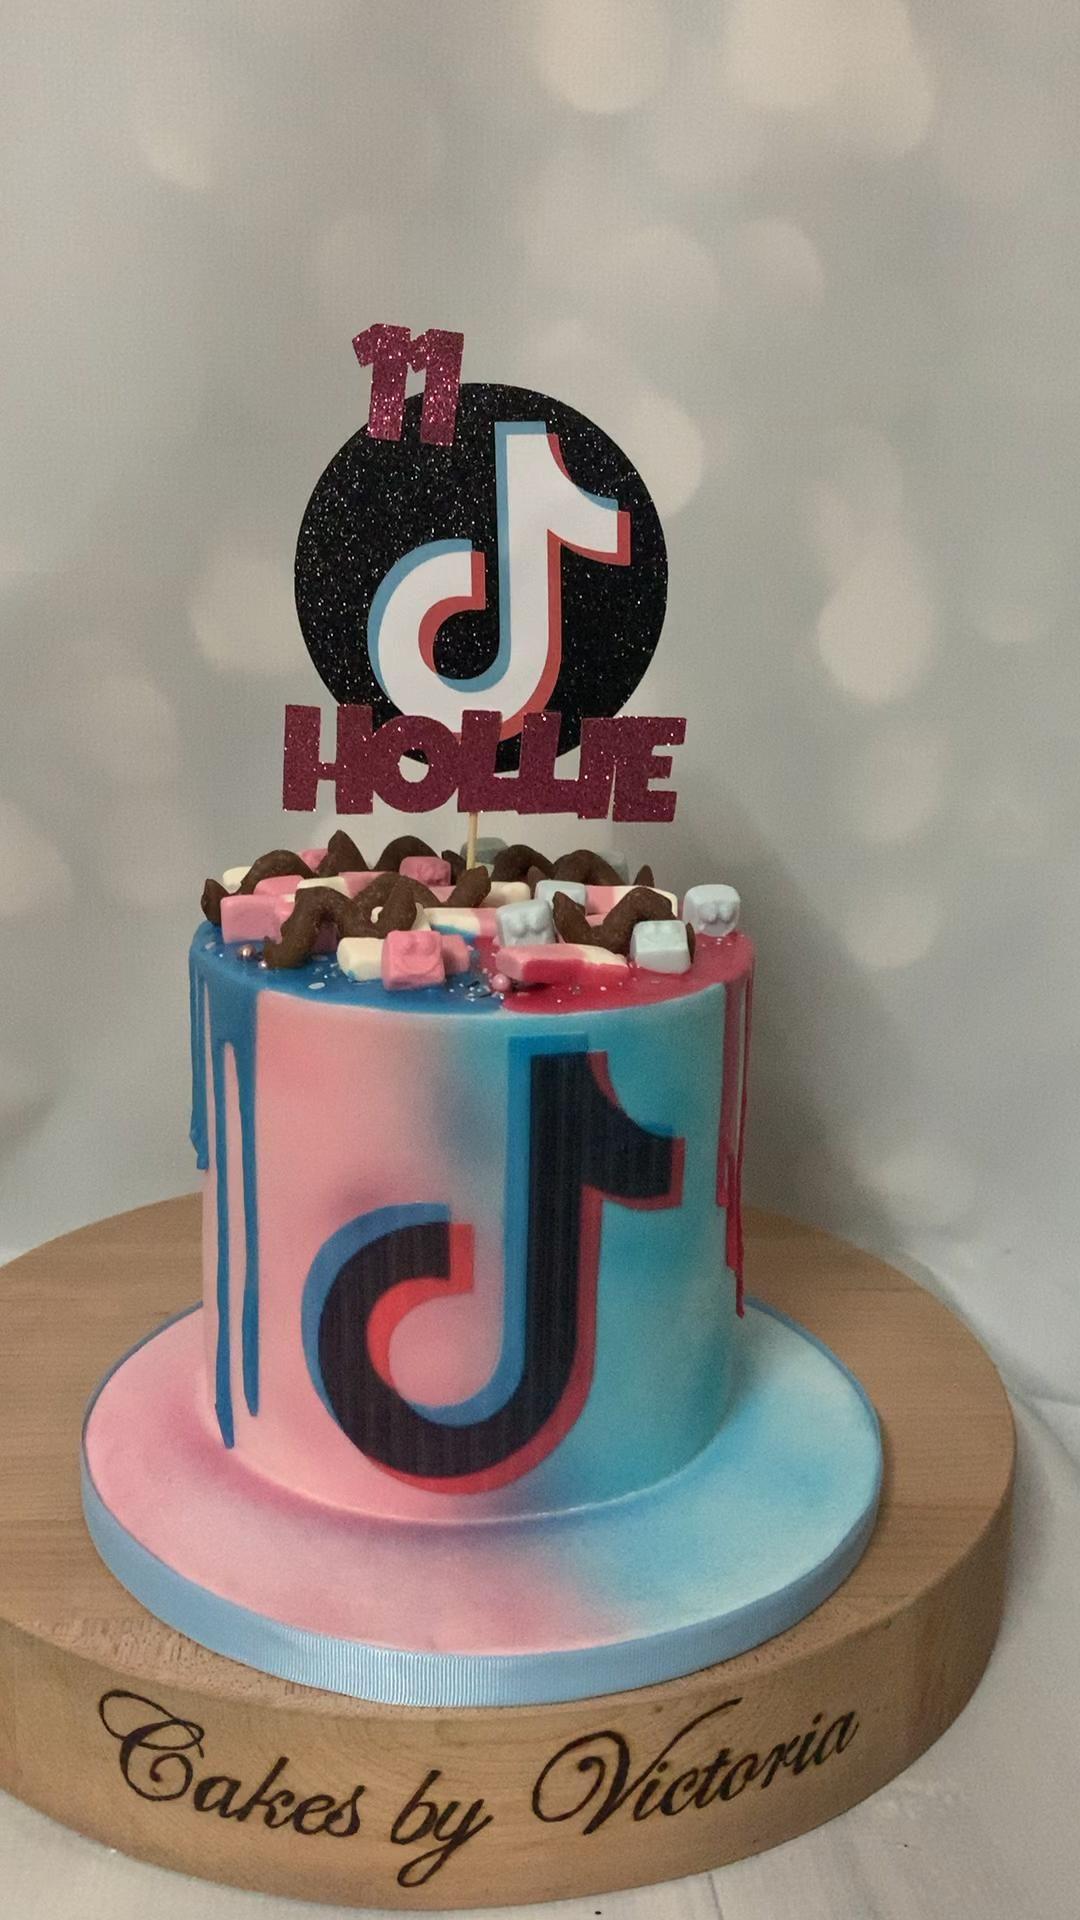 Tik Tok Theme Drip Cake Video In 2020 Cake Cake Decorating Techniques Rainbow Cake